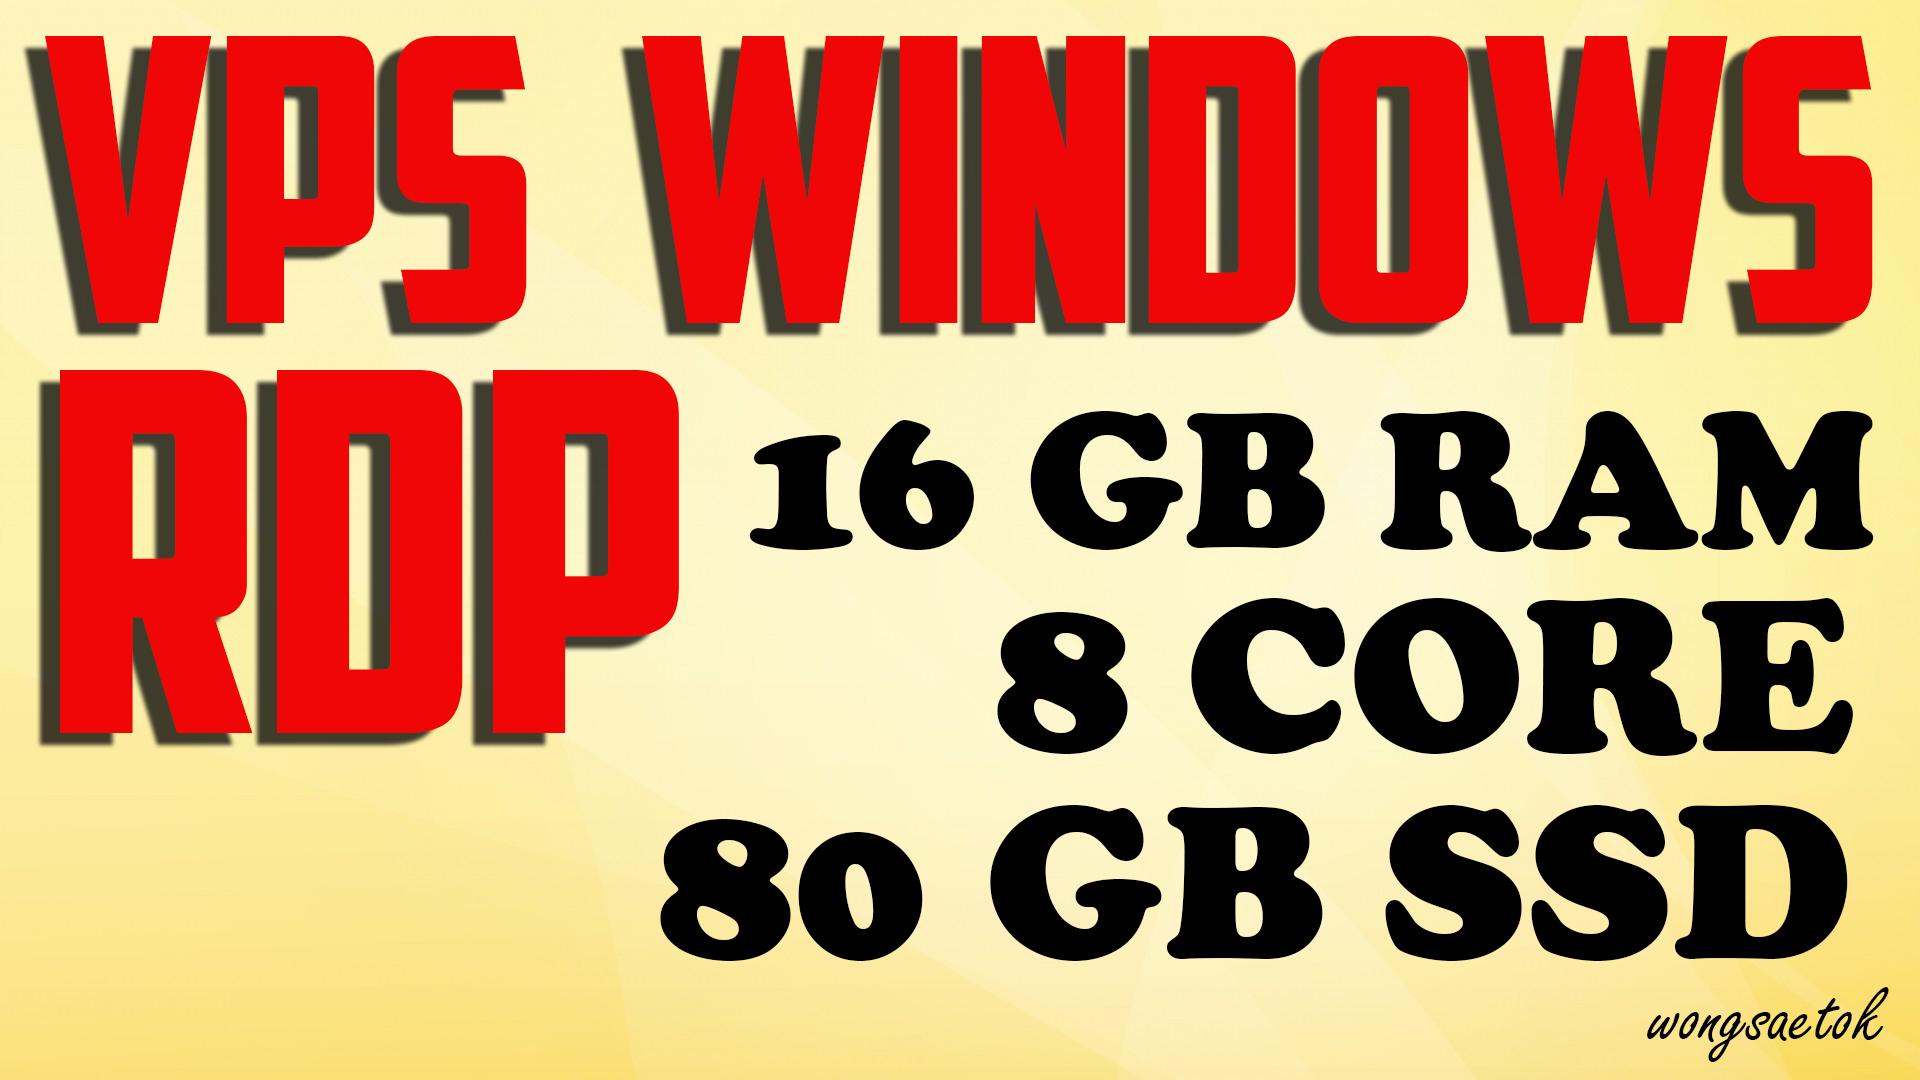 BIG SIZE Rdp Windows Vps CPU 8 CORE RAM 16GB SSD 80 GB RENEWAL